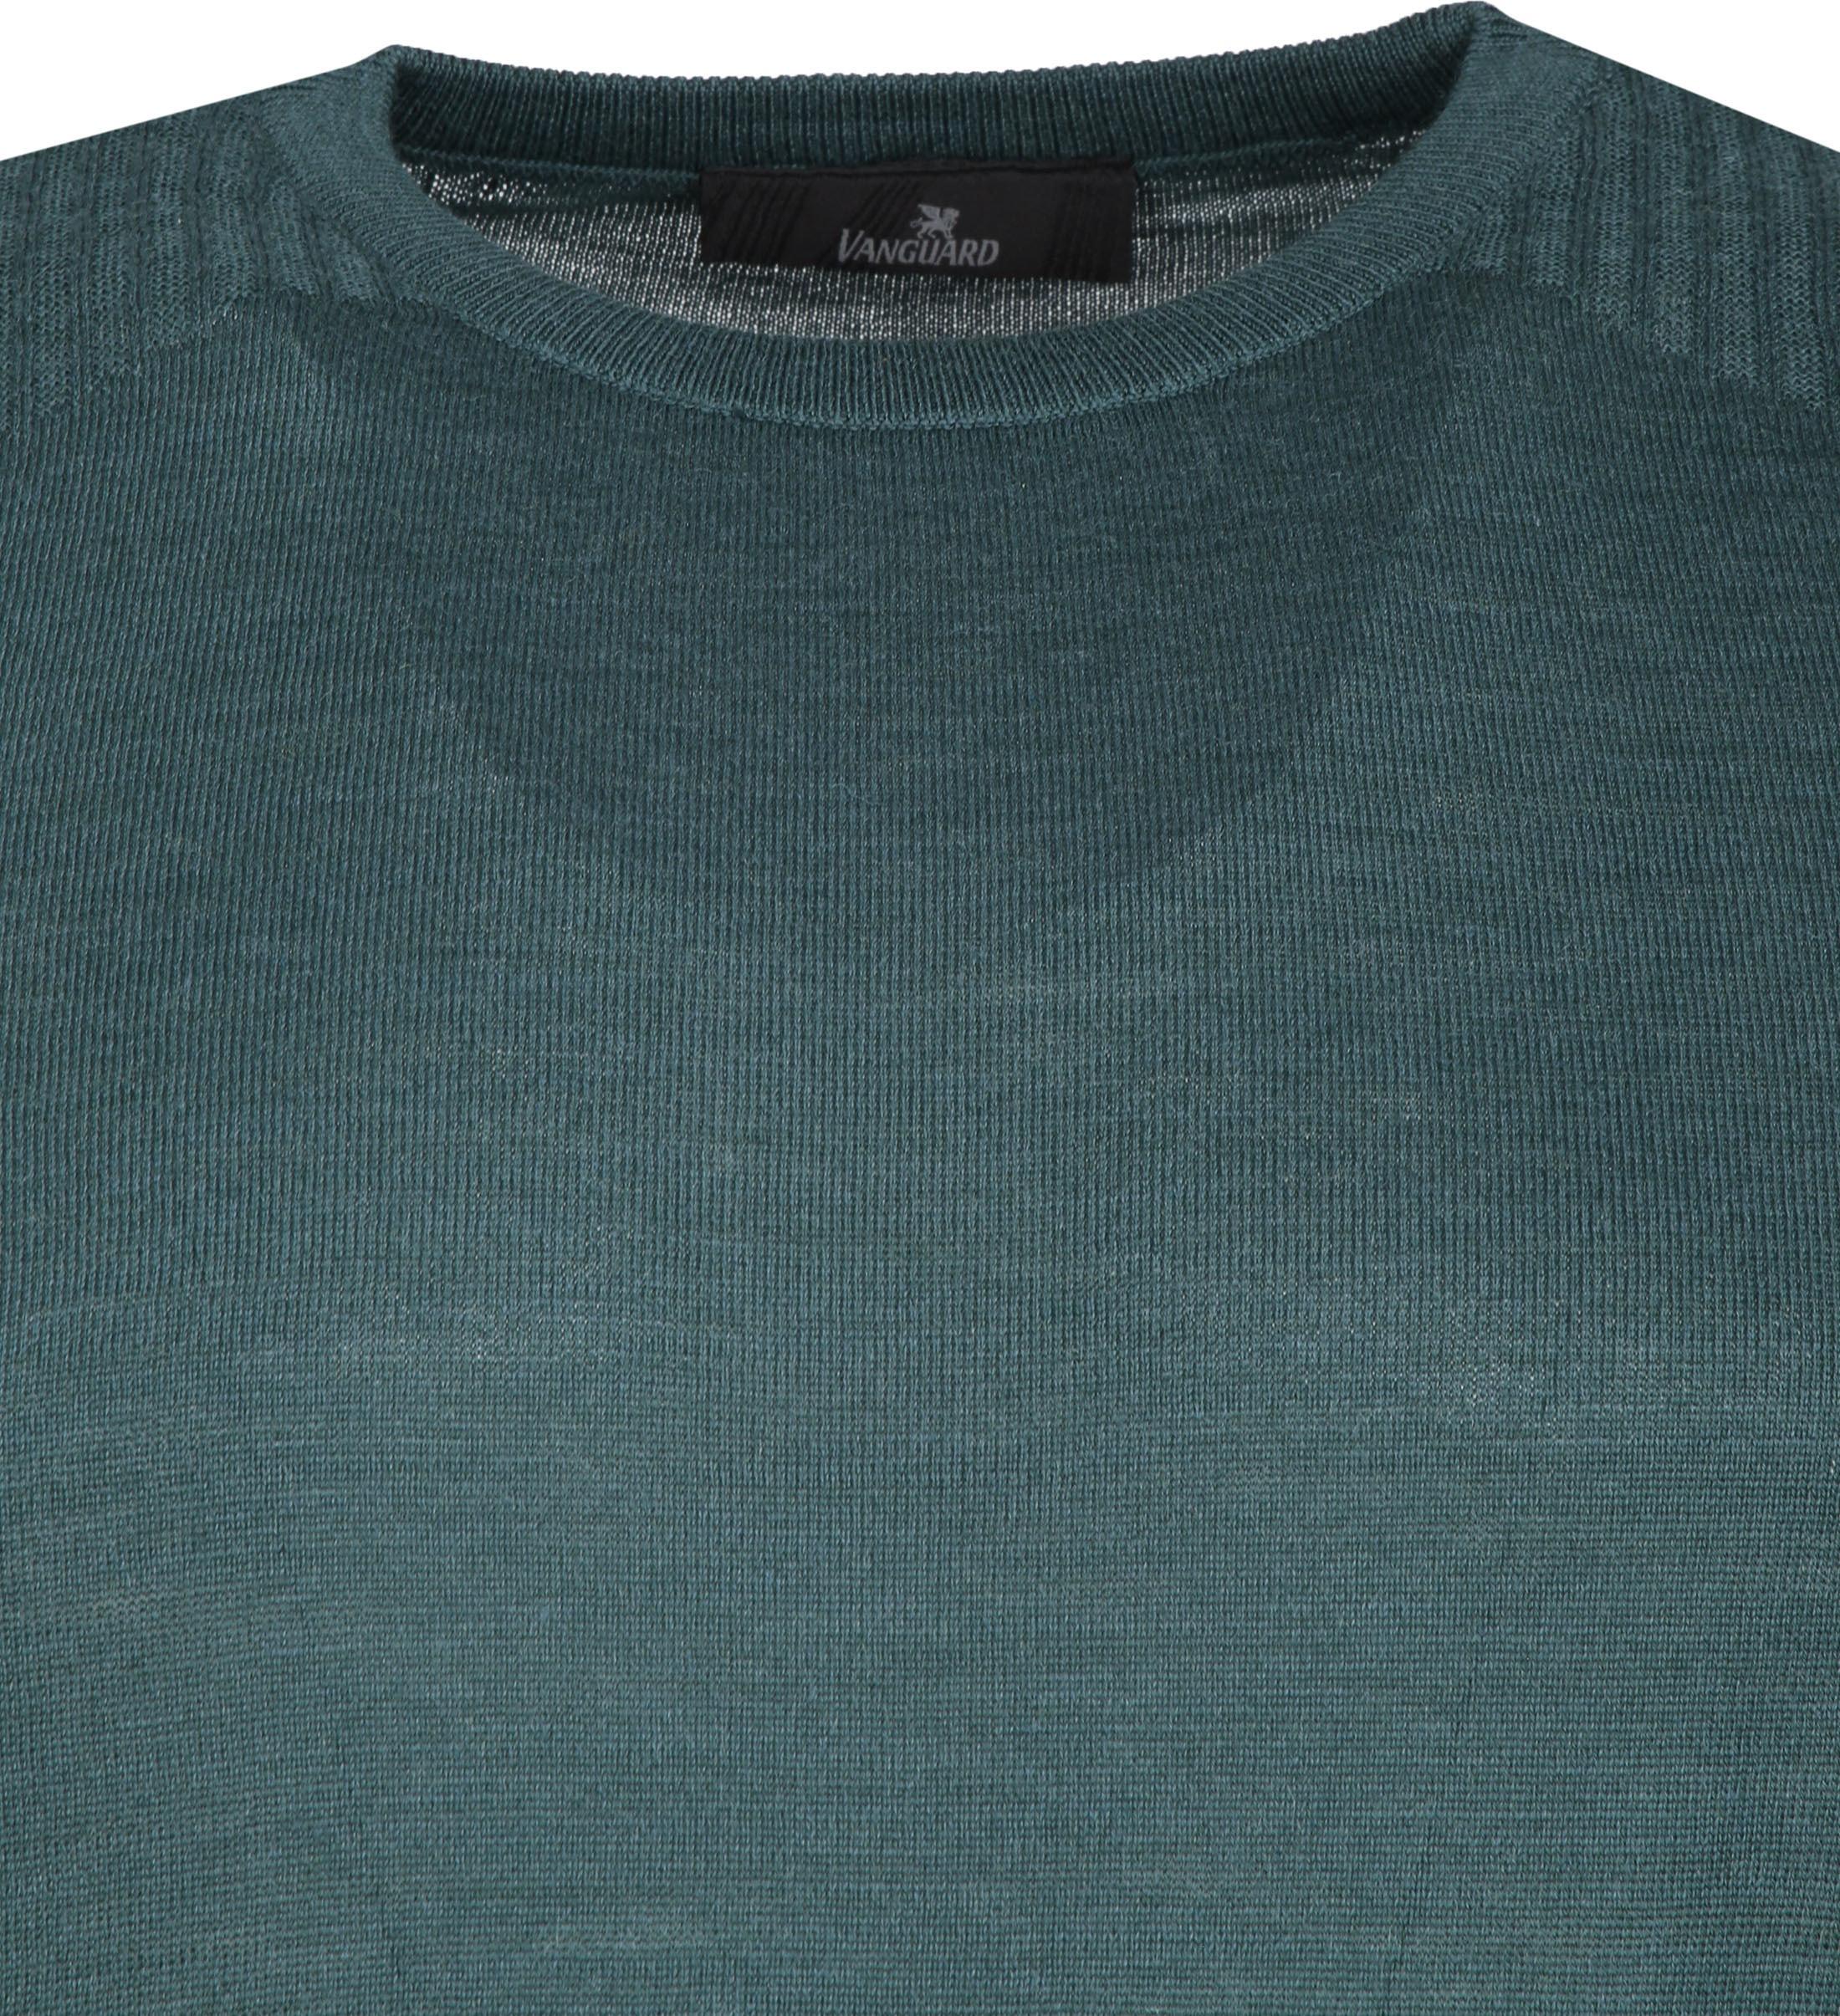 Vanguard Pullover Dark Green foto 1